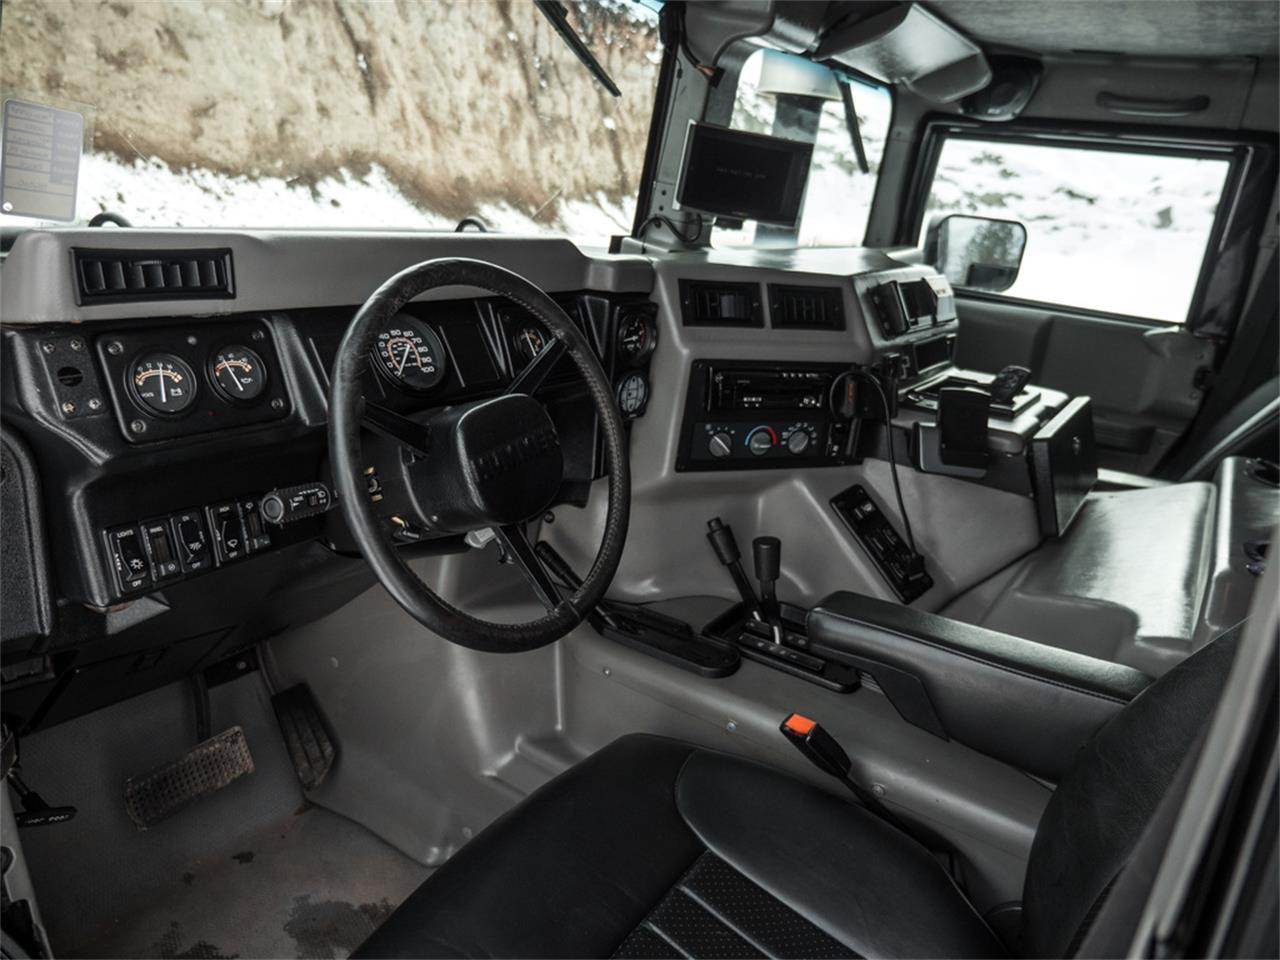 2000 Hummer H1 (CC-1305799) for sale in Kelowna, British Columbia